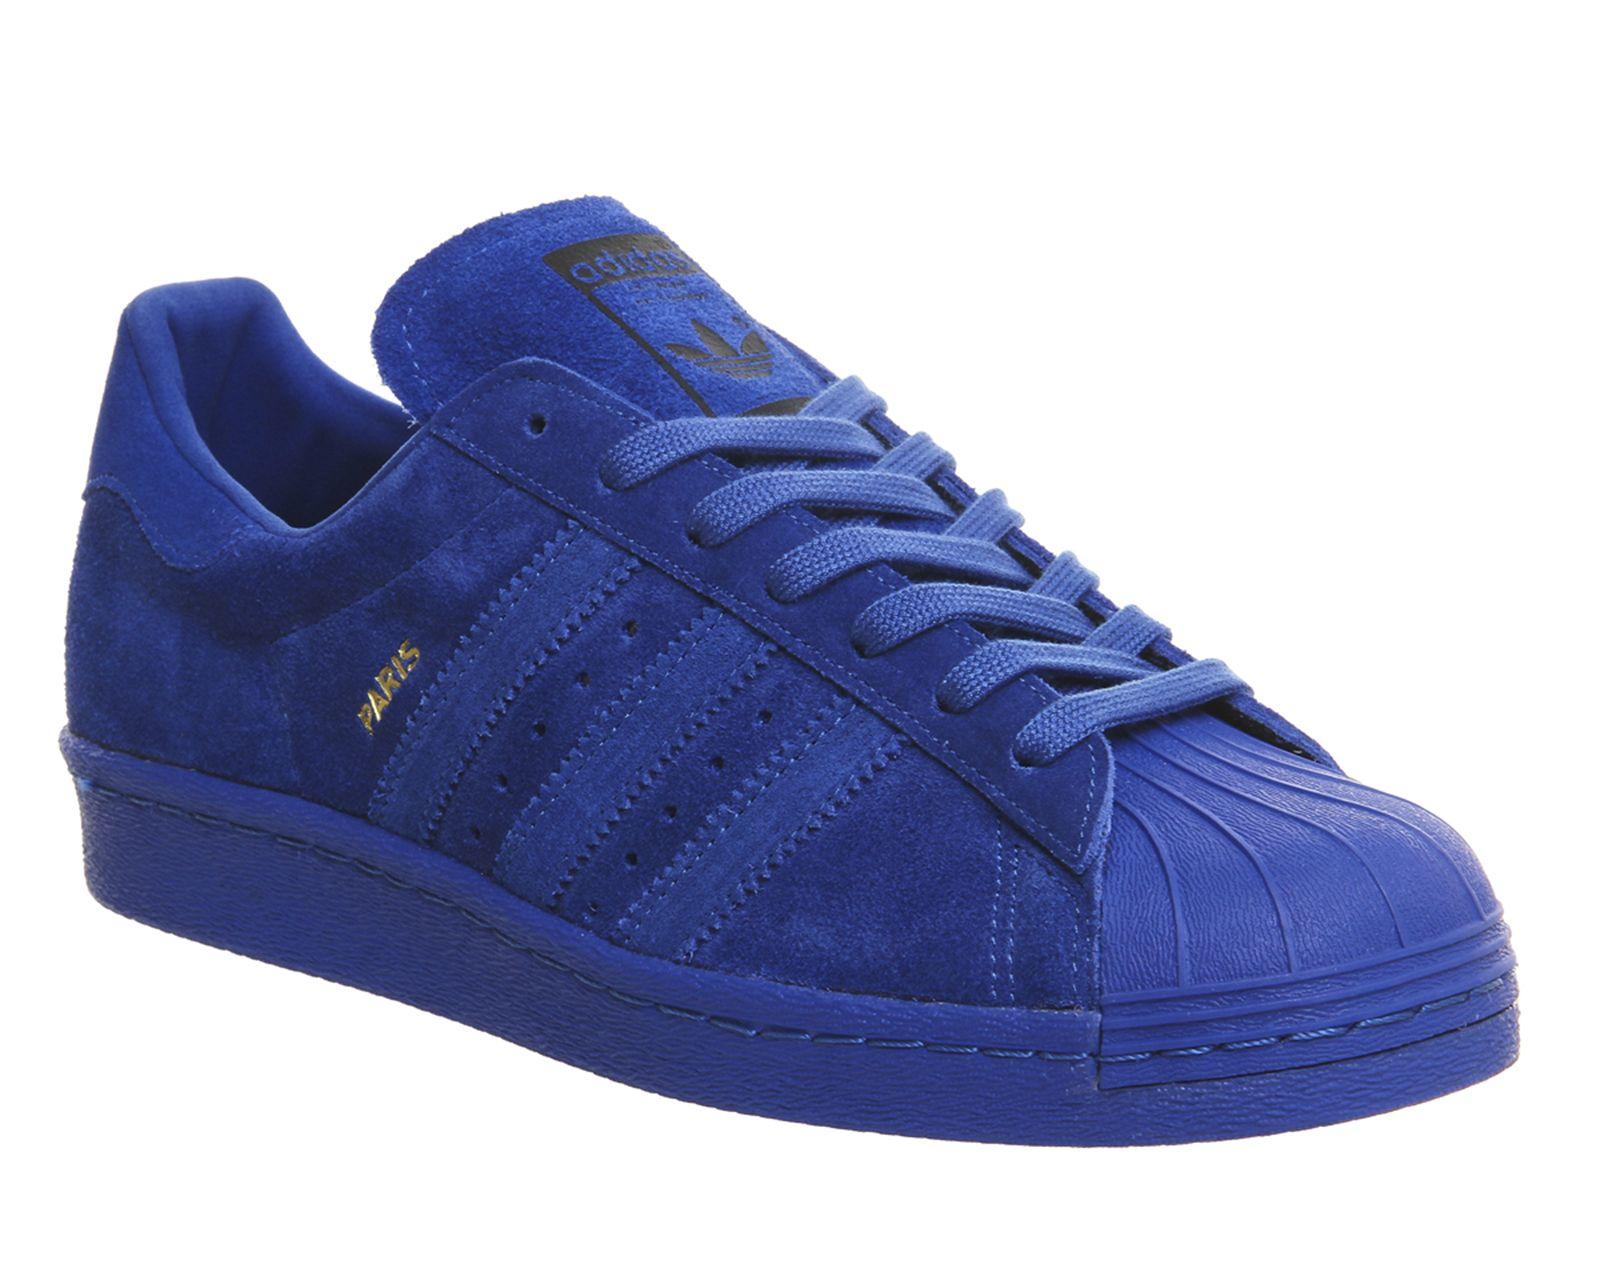 adidas superstar degli anni '80 città confezione blu parigi unisex sport freschi